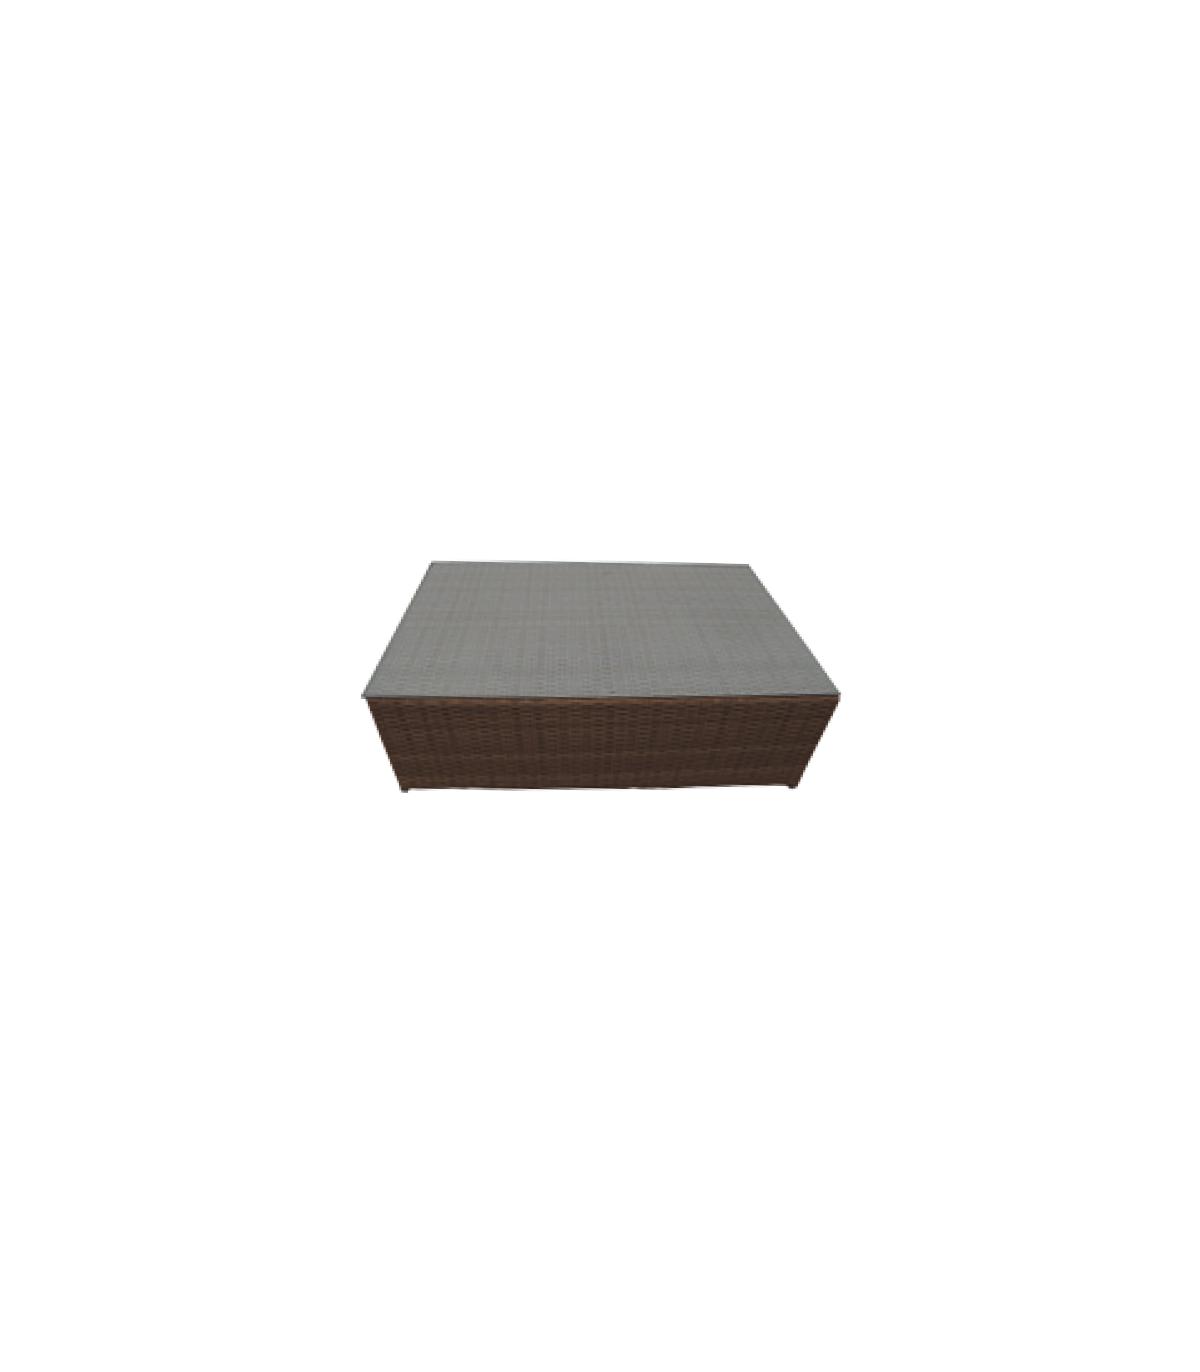 table basse osier tress humphrey res. Black Bedroom Furniture Sets. Home Design Ideas